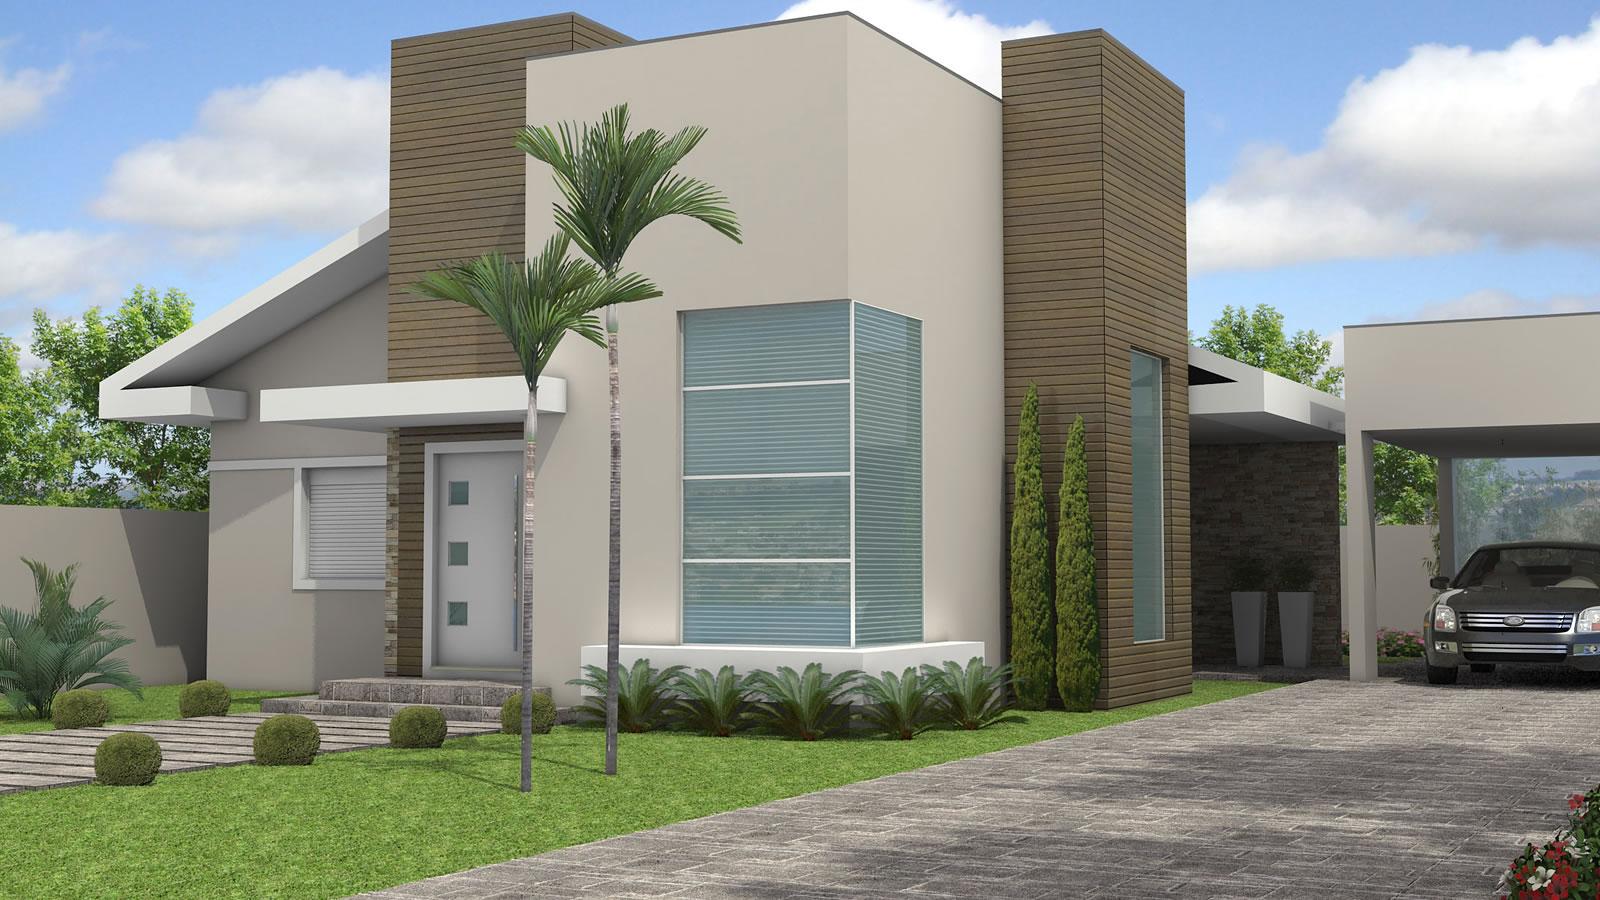 Fotos de fachadas de casas simples t rreas decorando casas for Casas modernas de 70m2